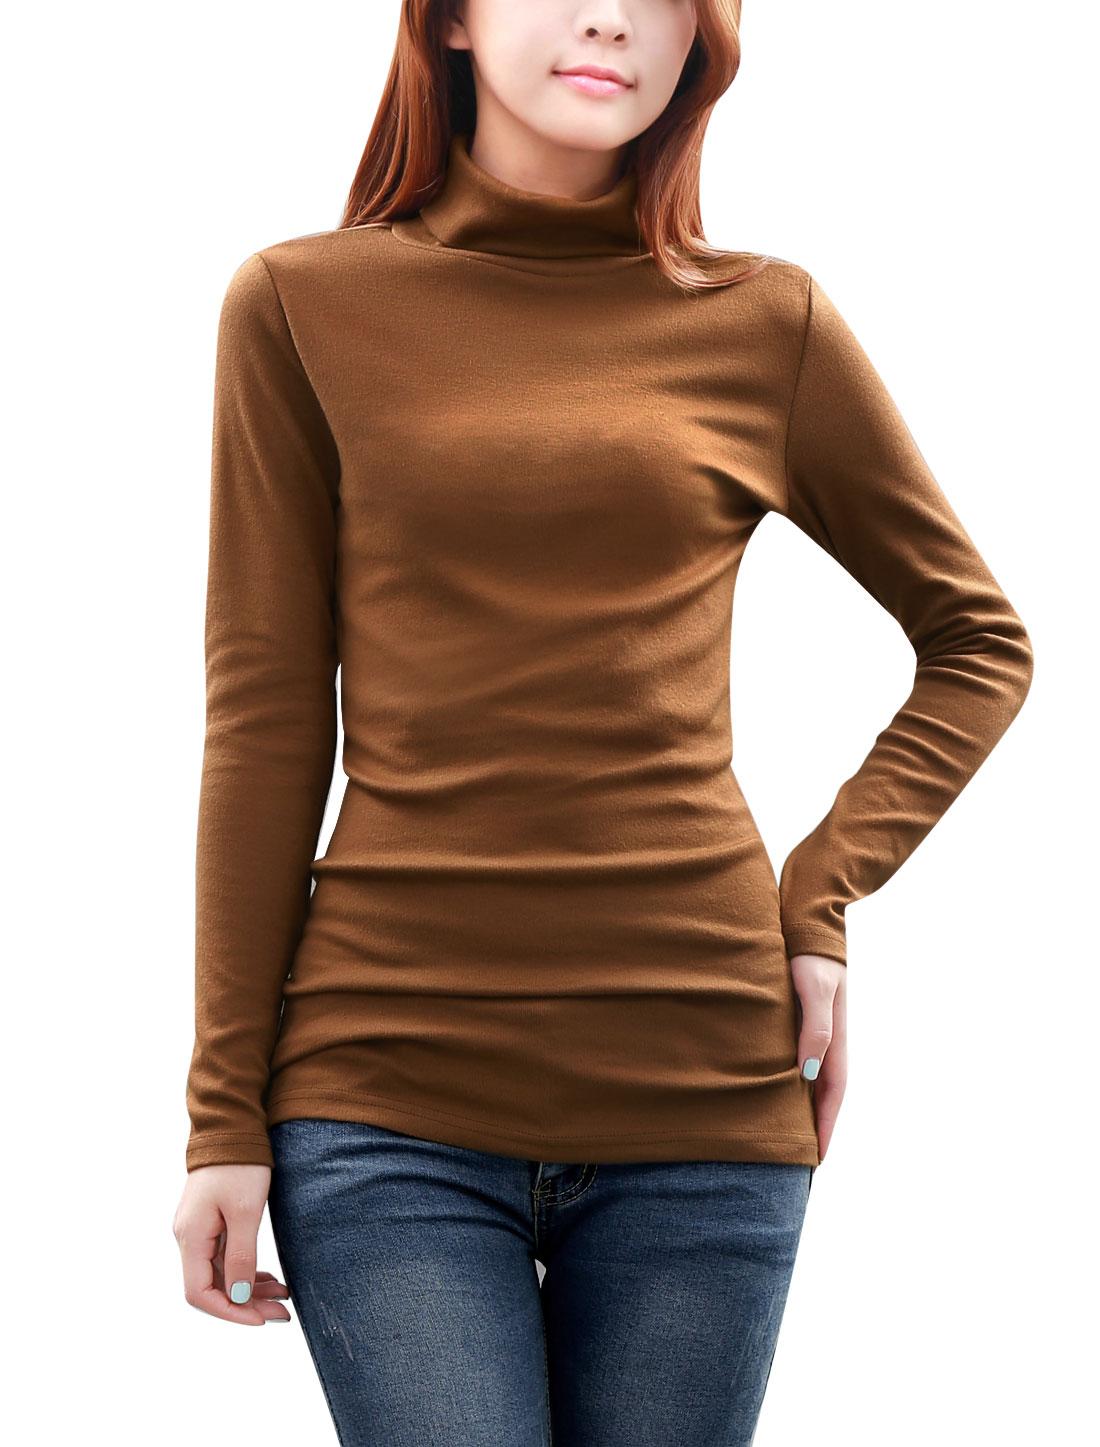 Ladies Turtle Neck Pure Design Stretchy Knit Shirt Khaki M